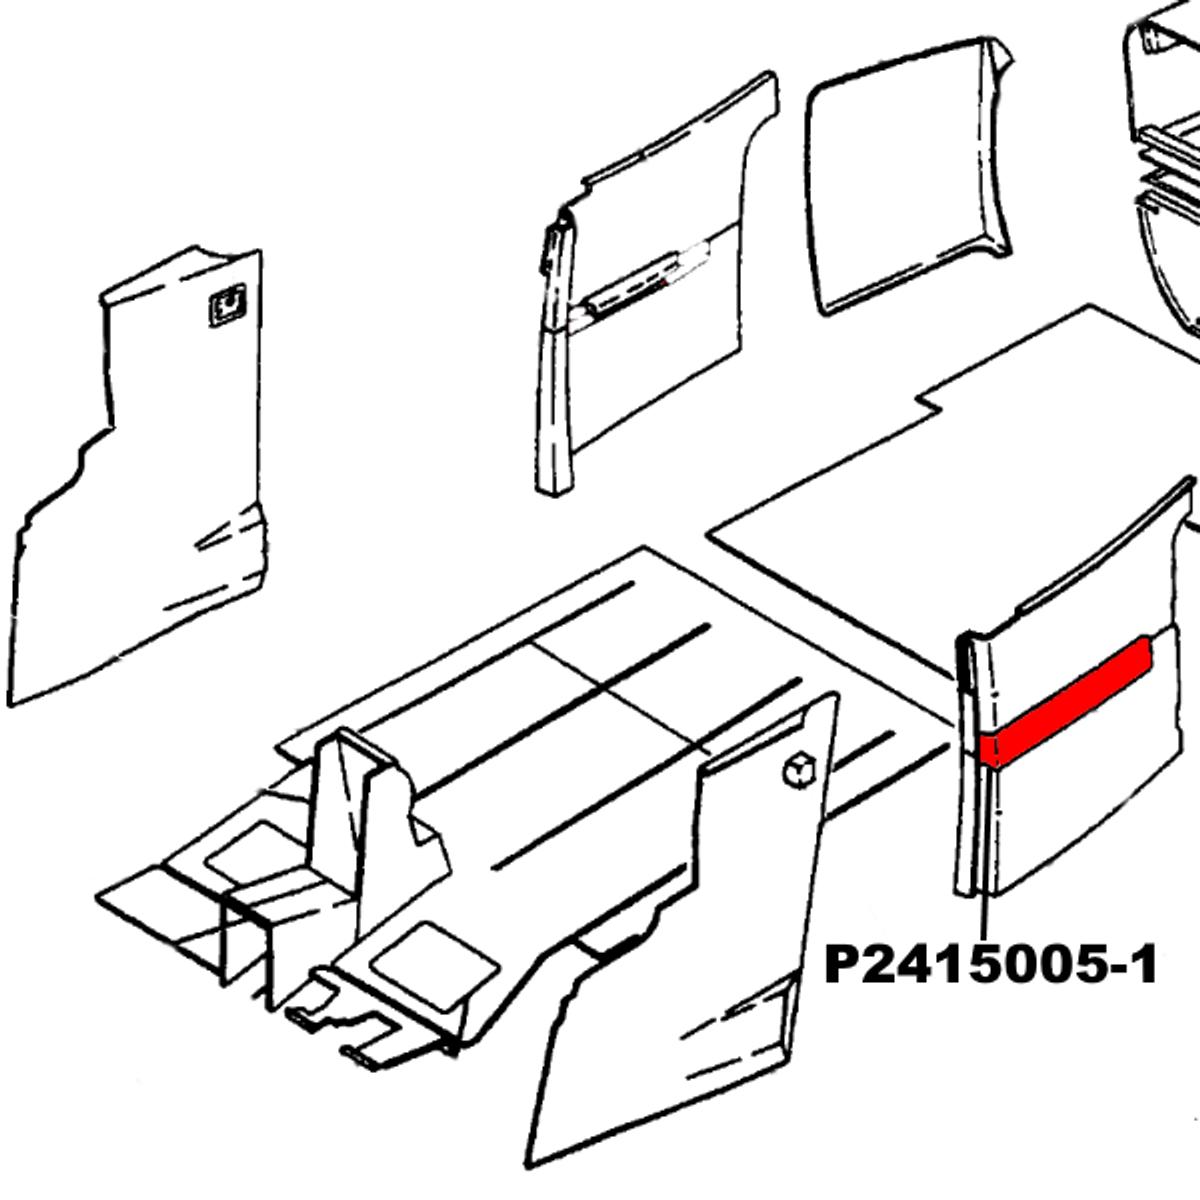 Armrest Support Assy - Rear LH/RH Cessna 172P,  Replaces Part 2415005-1, 2415005-2